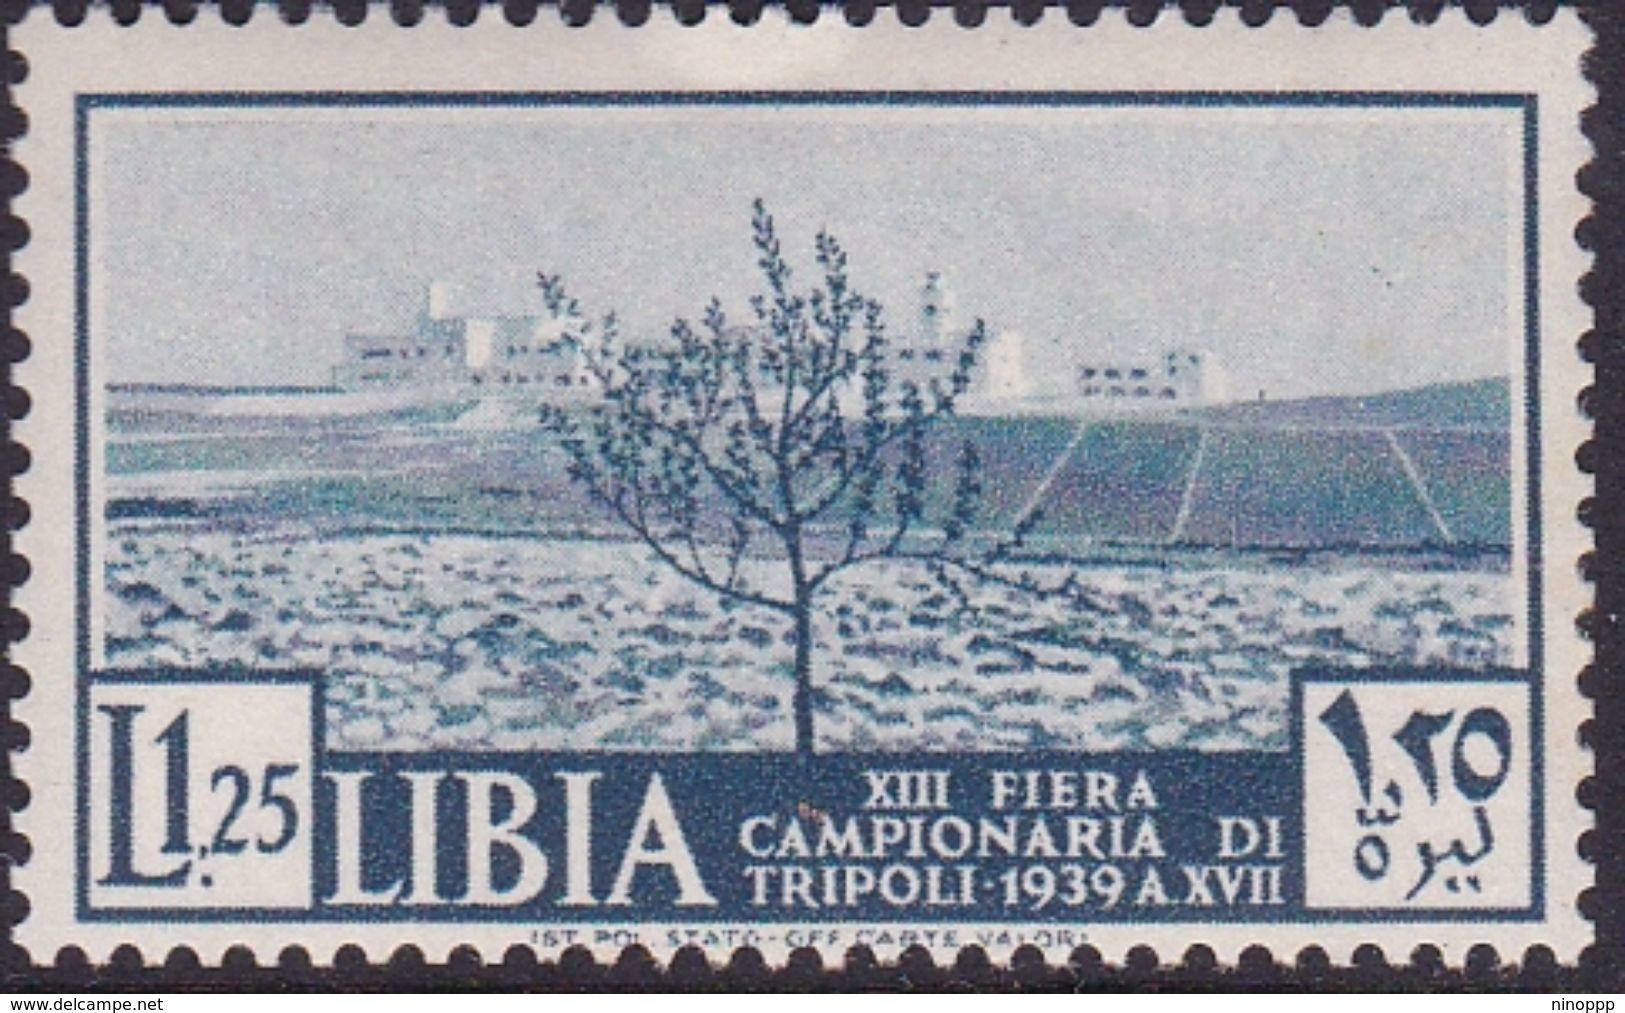 Italy-Colonies And Territories-Libya S 162 1938 13th Tripoli Fair,1,25 Lira Blue,mint Hinged - Libya